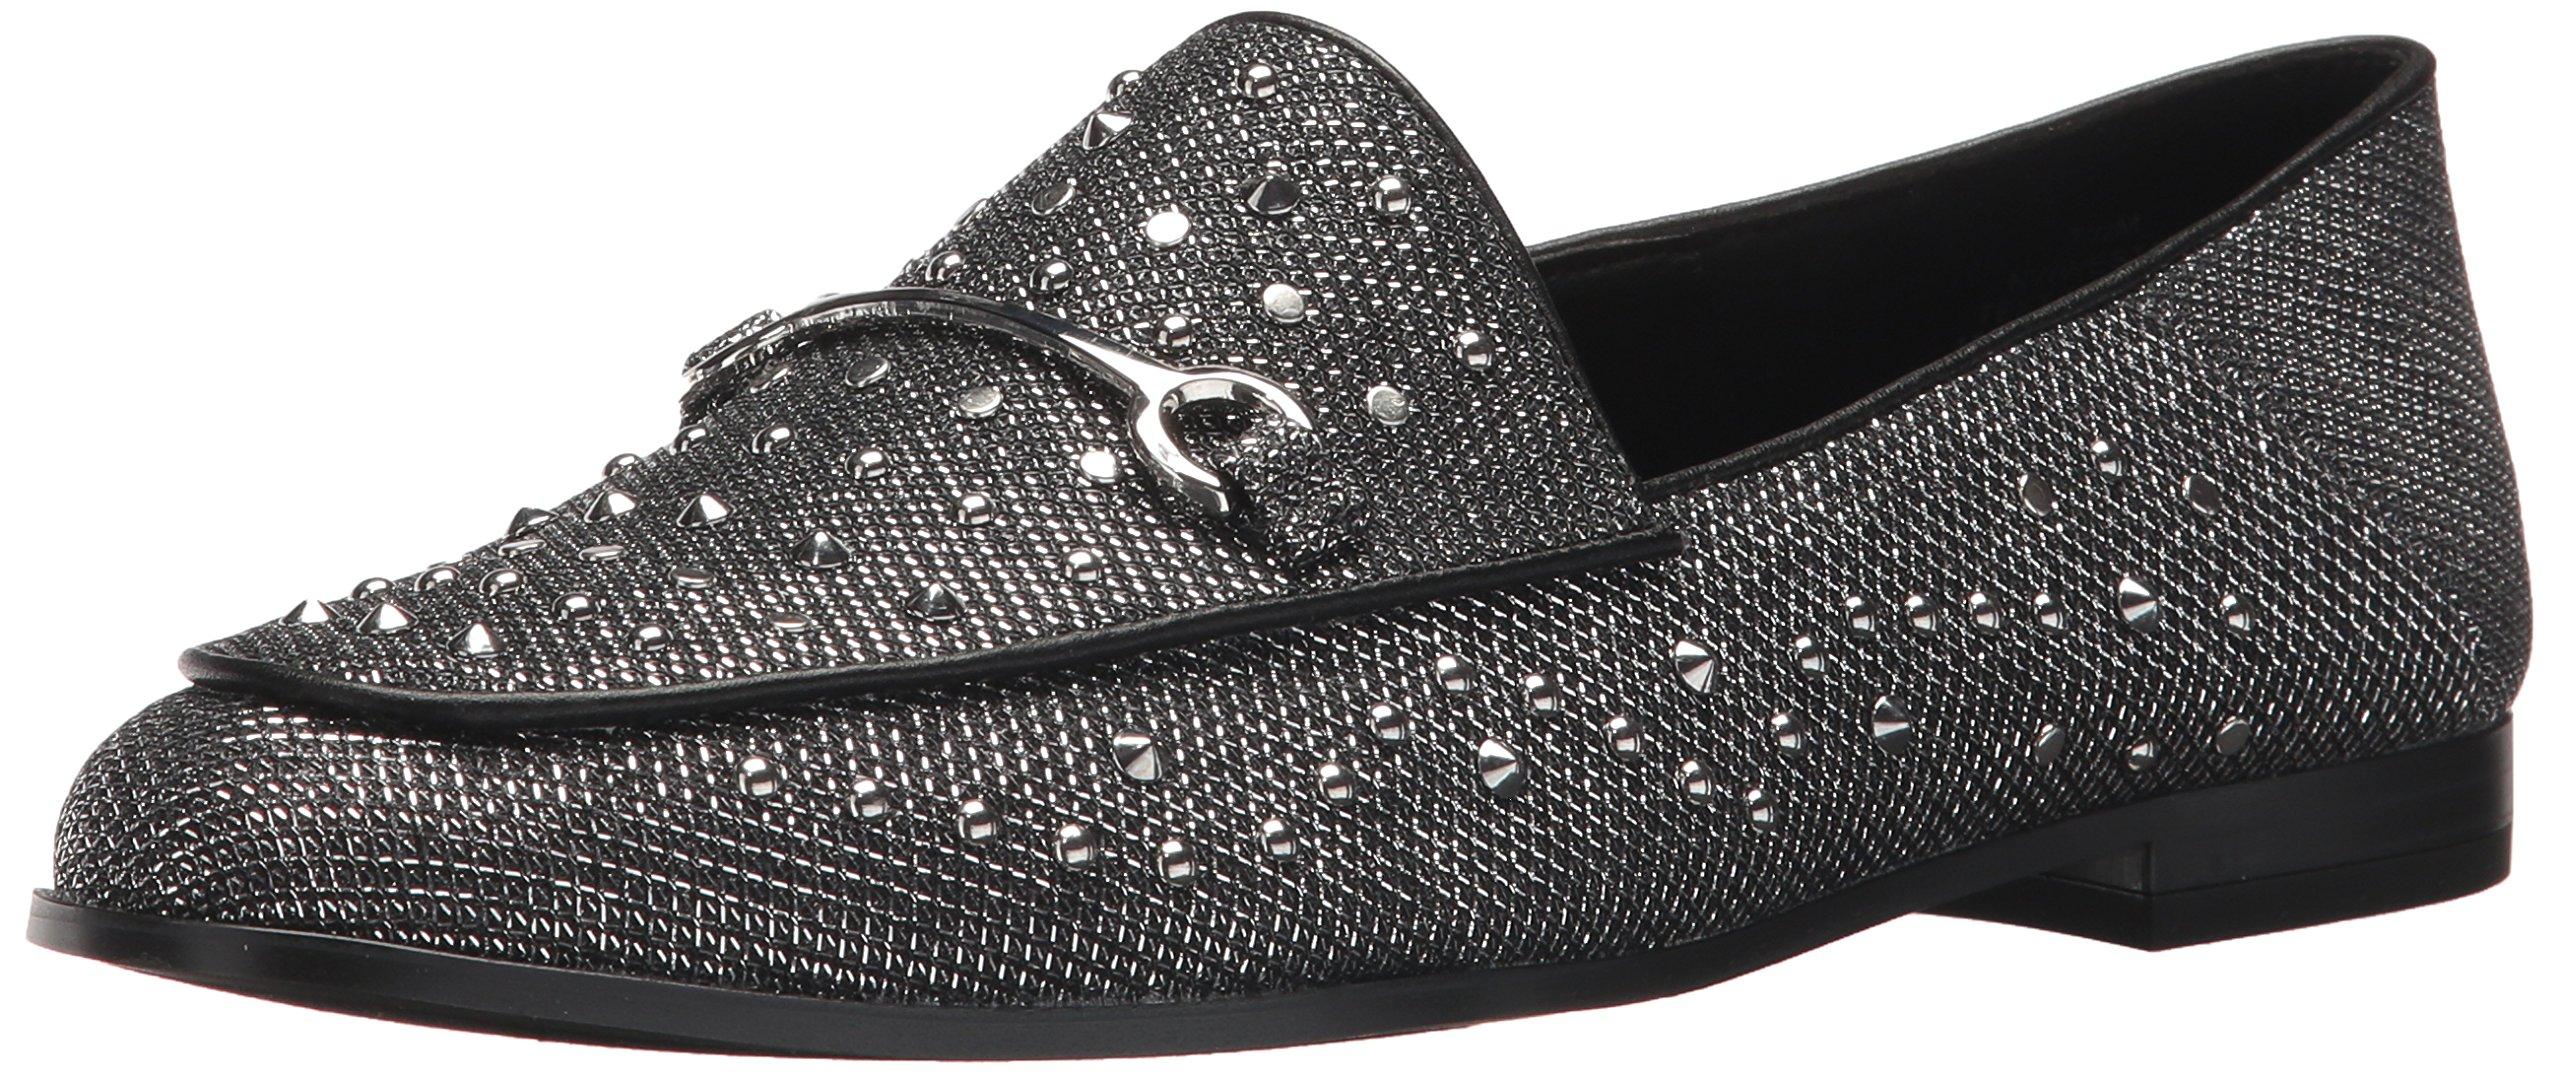 Nine West Women's Westoy Fabric Loafer Flat, Black-Silver-Black Fabric, 10.5 Medium US